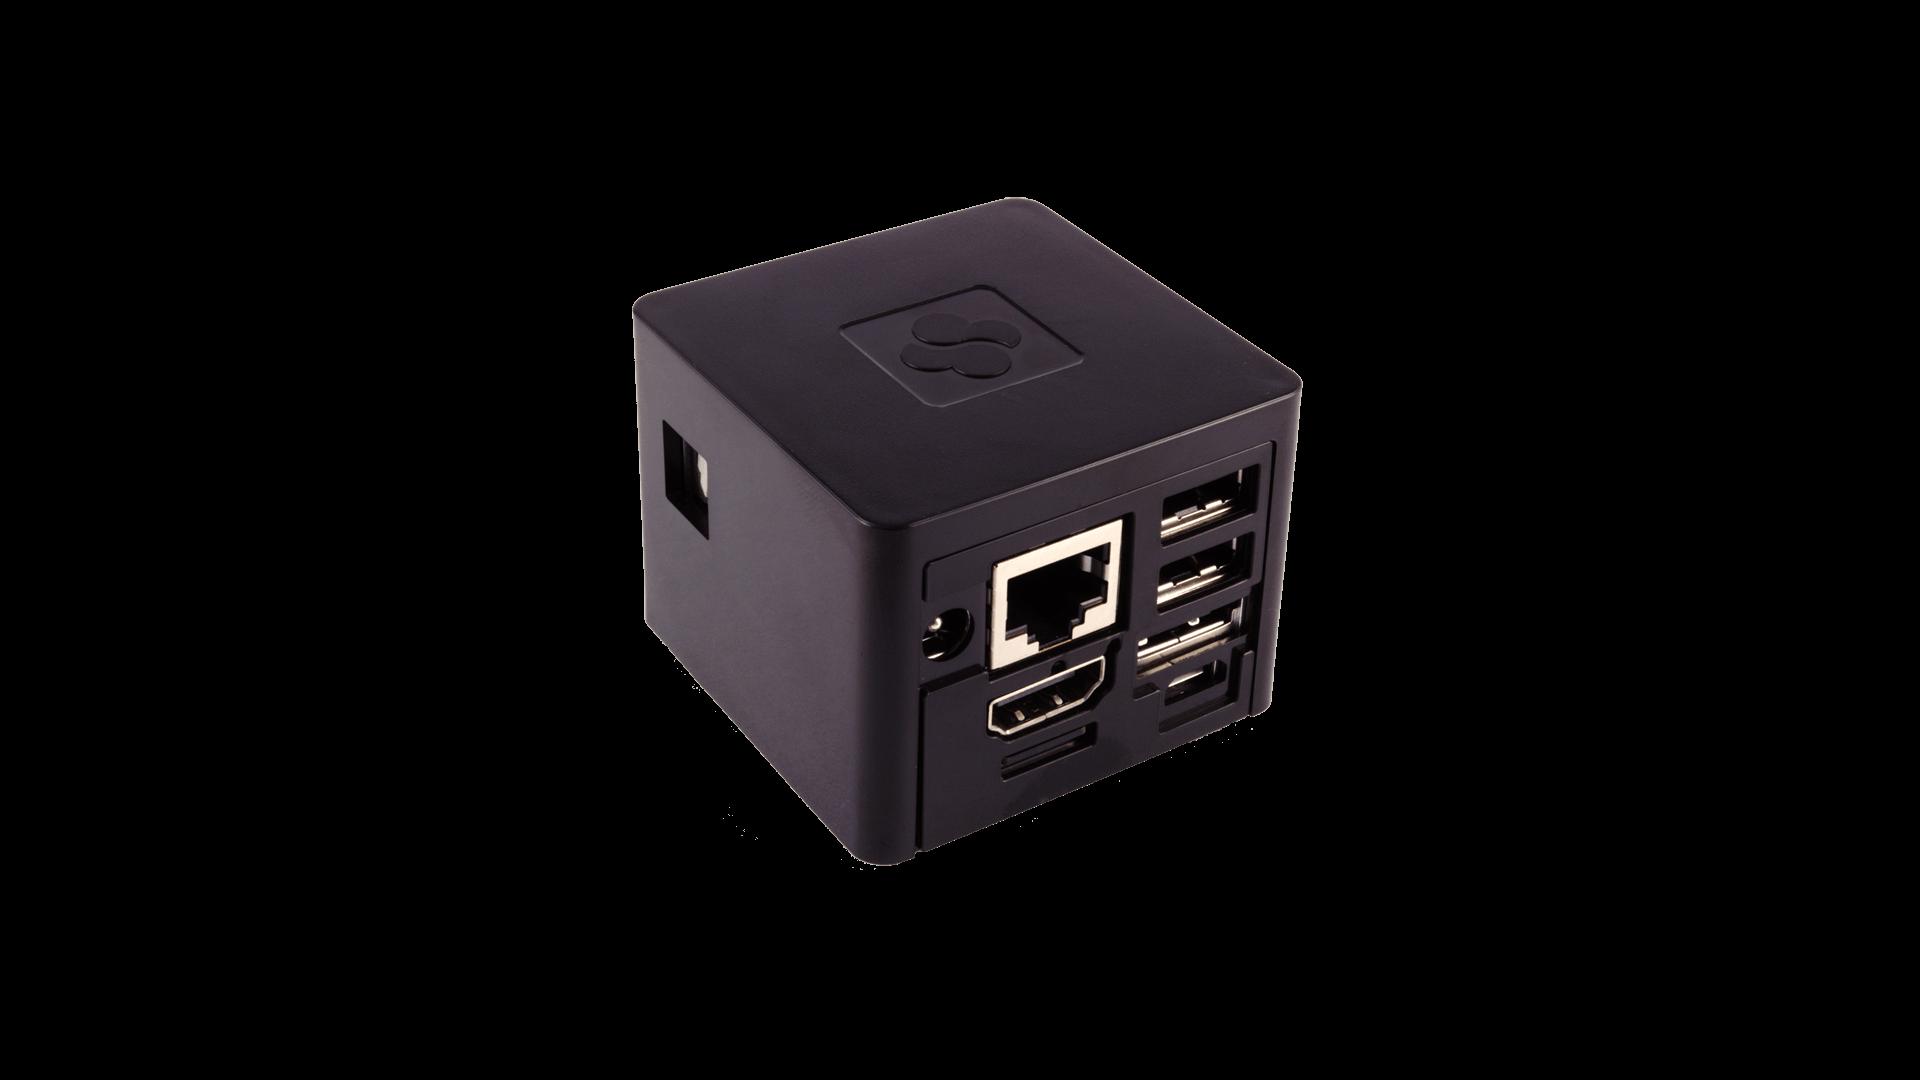 Solidrun Cubox-i